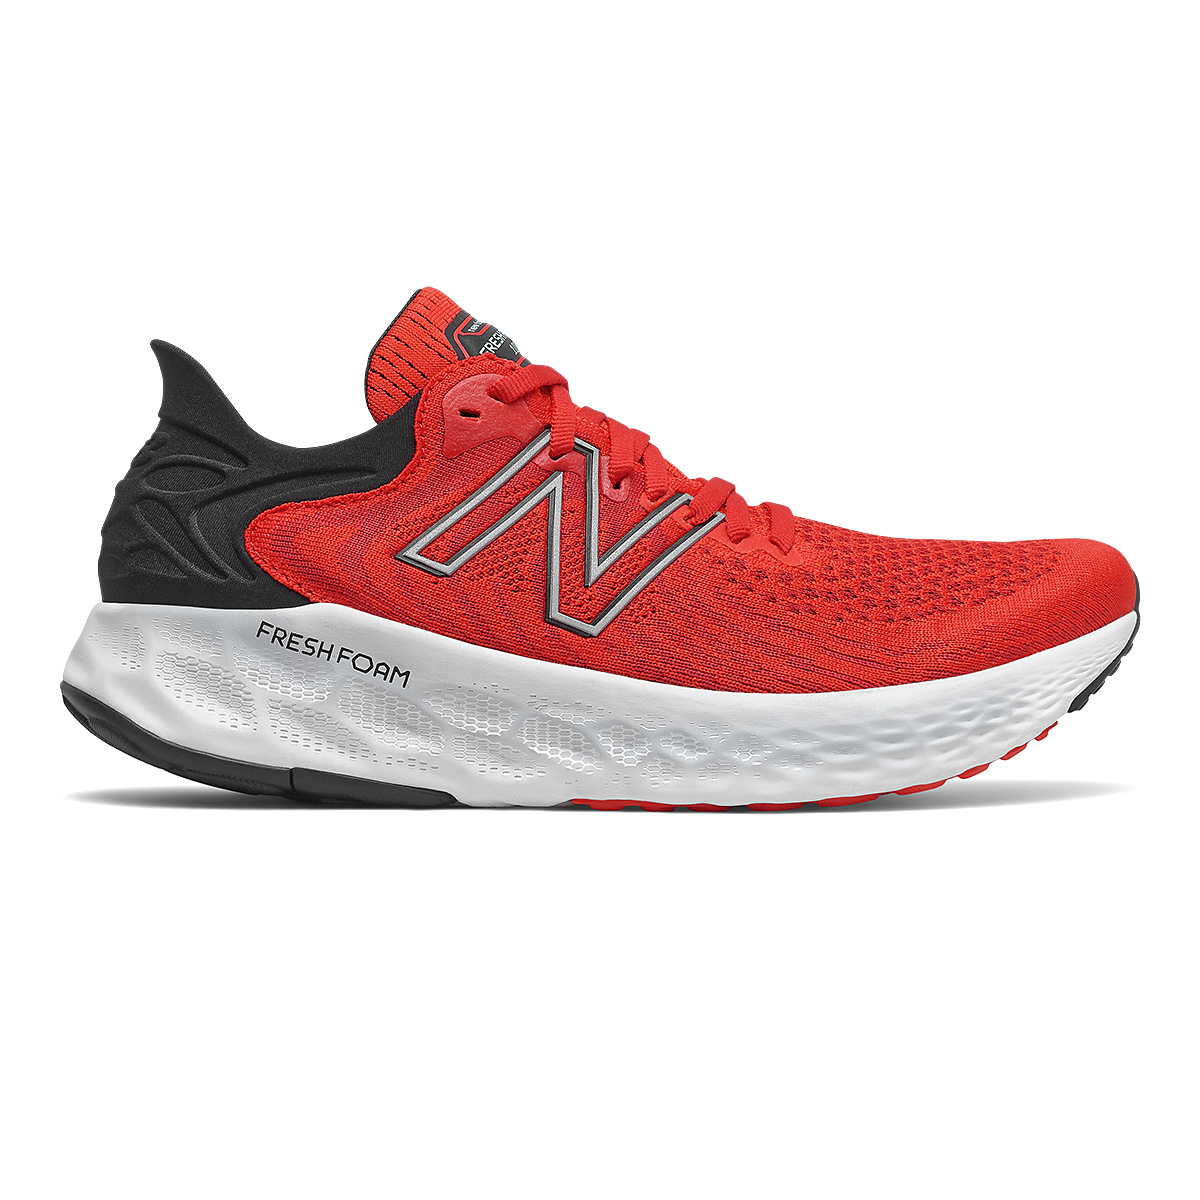 Men's New Balance 1080v11 Running Shoe - Color: Velocity Red/Black - Size: 7 - Width: Wide, Velocity Red/Black, large, image 1